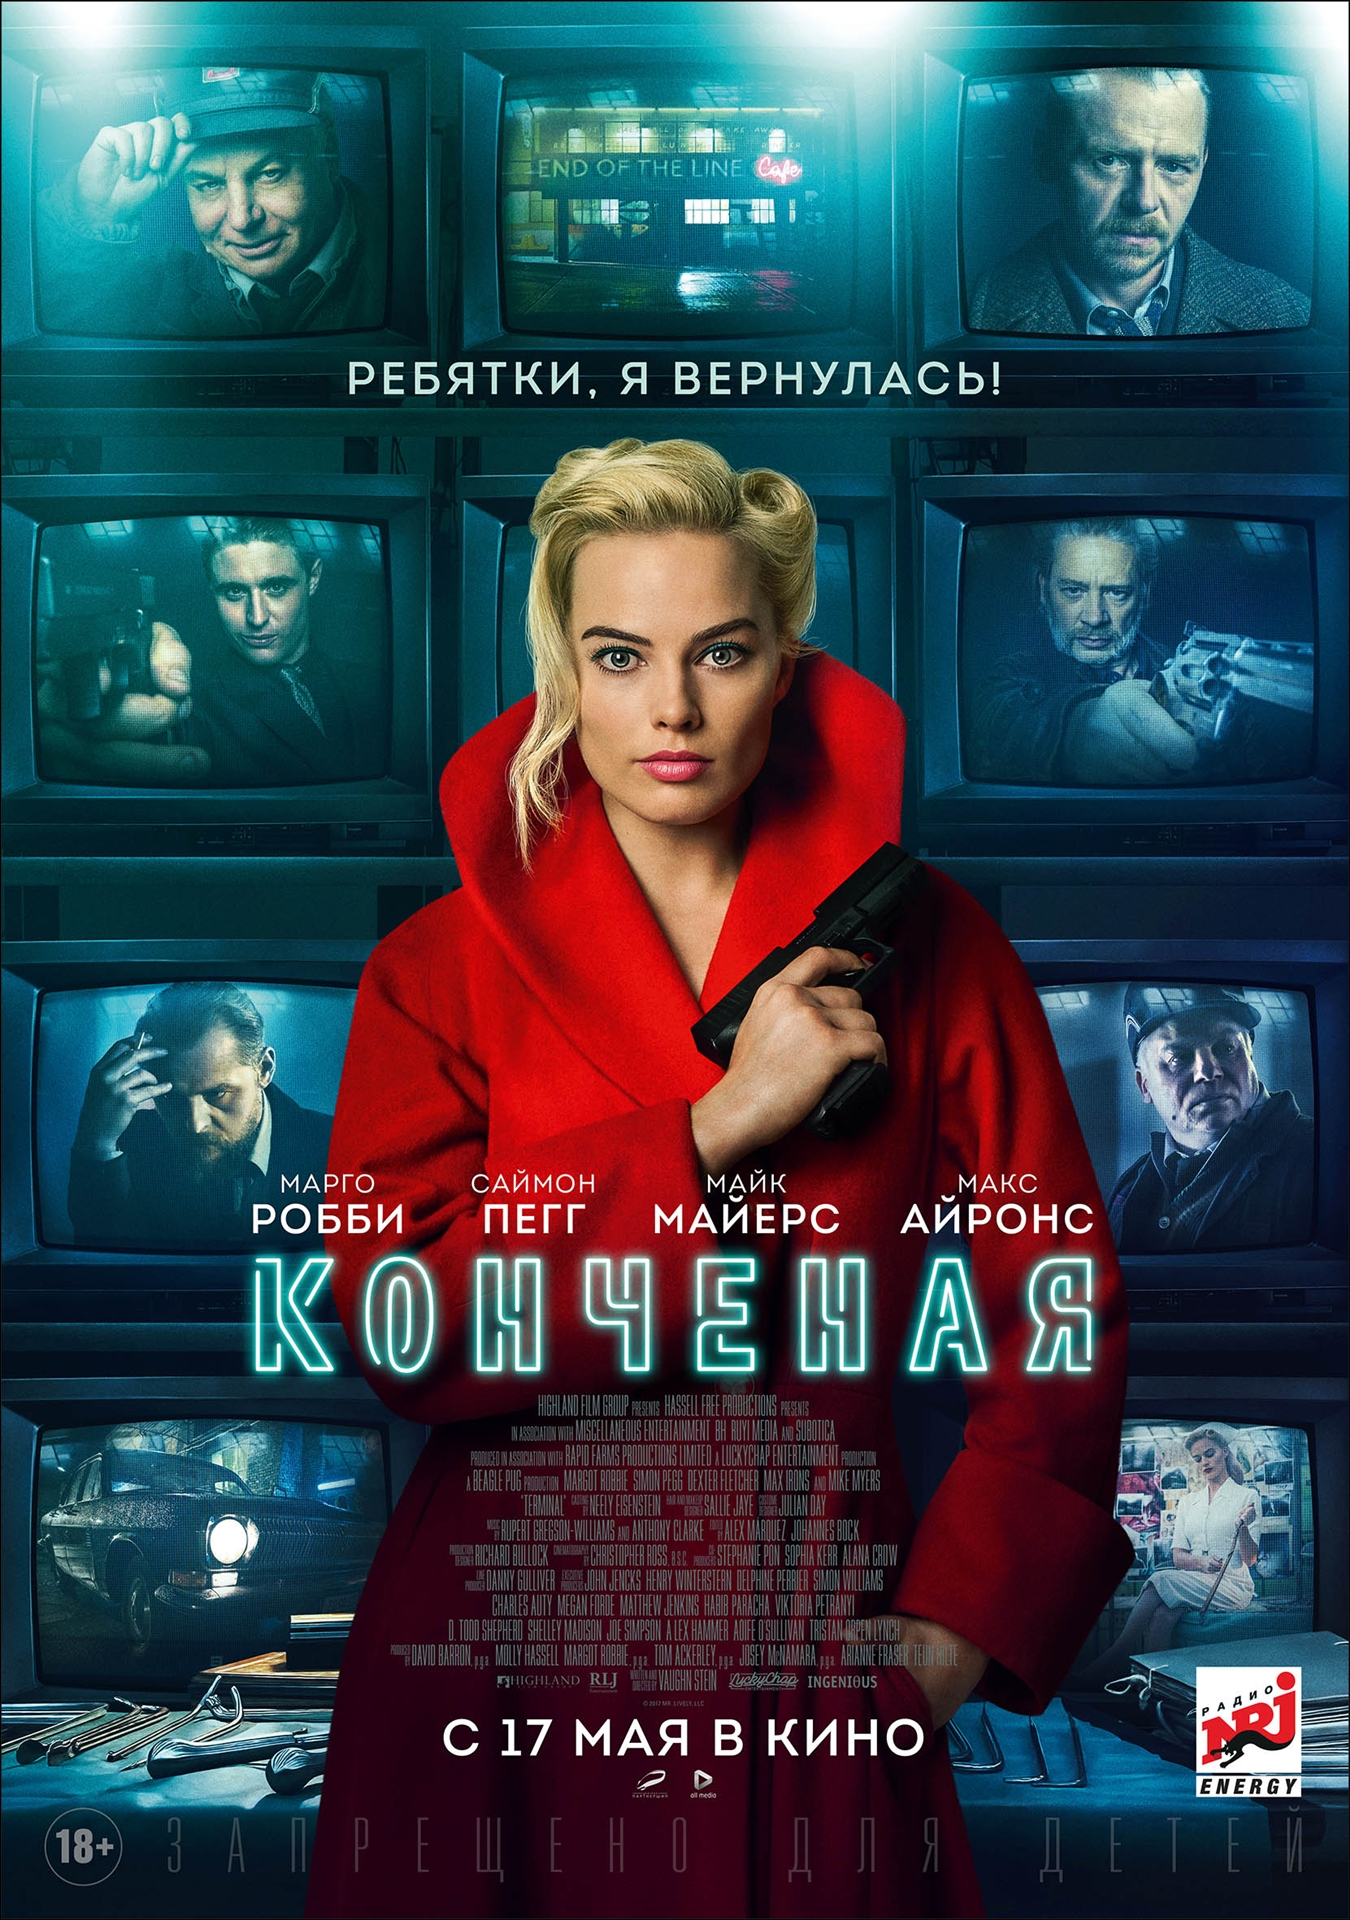 https://cdn.shazoo.ru/251510_ScZifX7mZd_konchenaya_poster.jpg